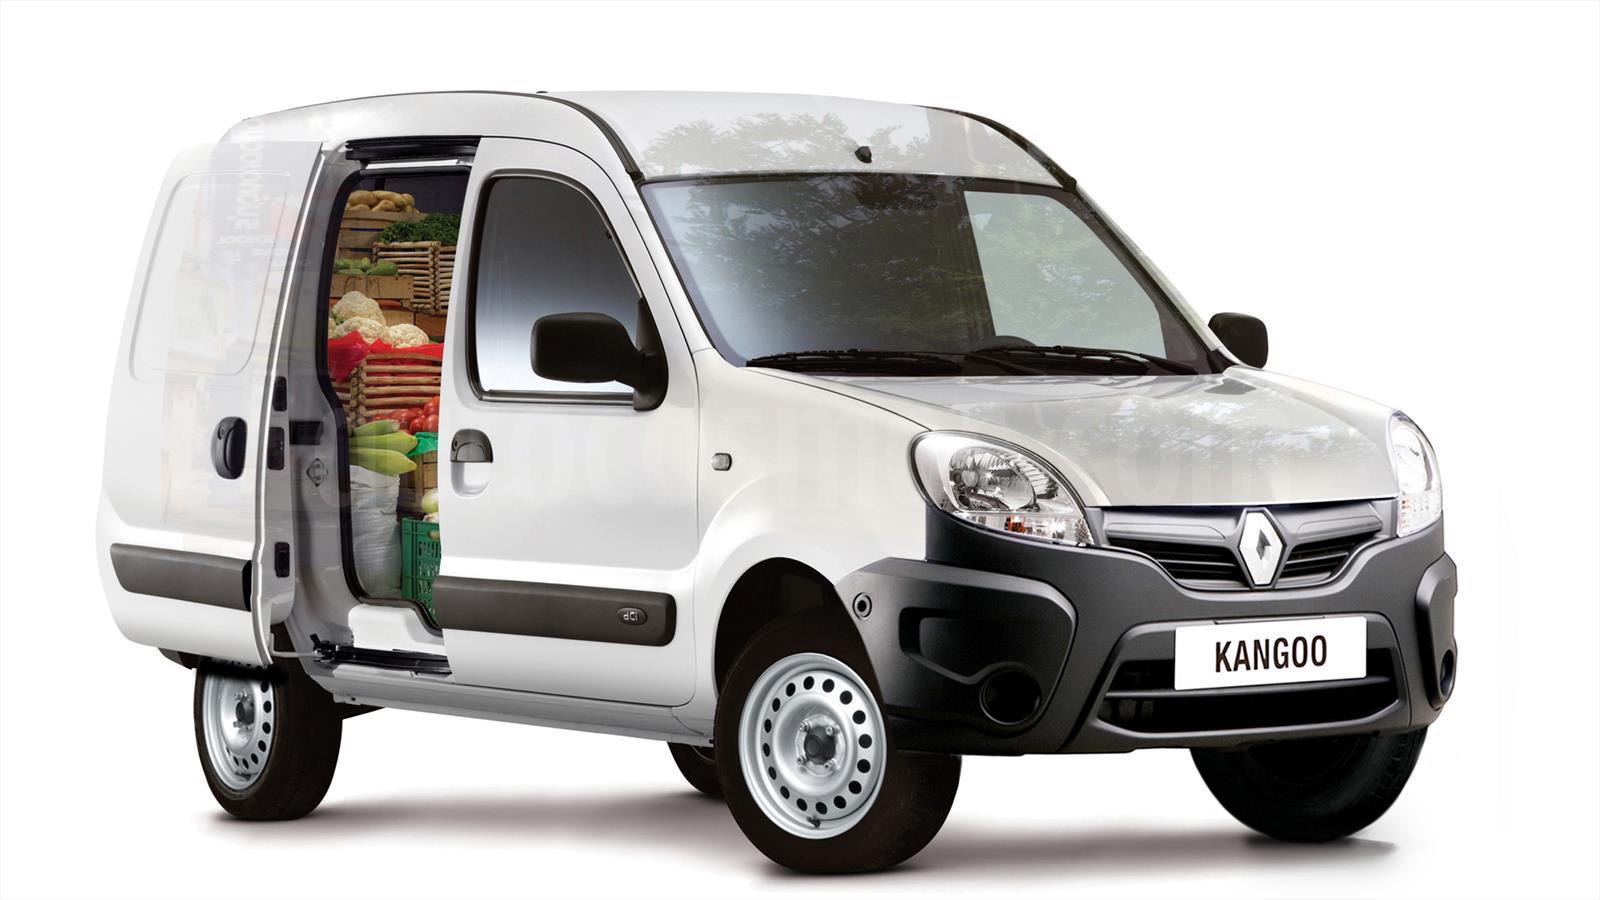 camionetas en olx ecuador autos post. Black Bedroom Furniture Sets. Home Design Ideas